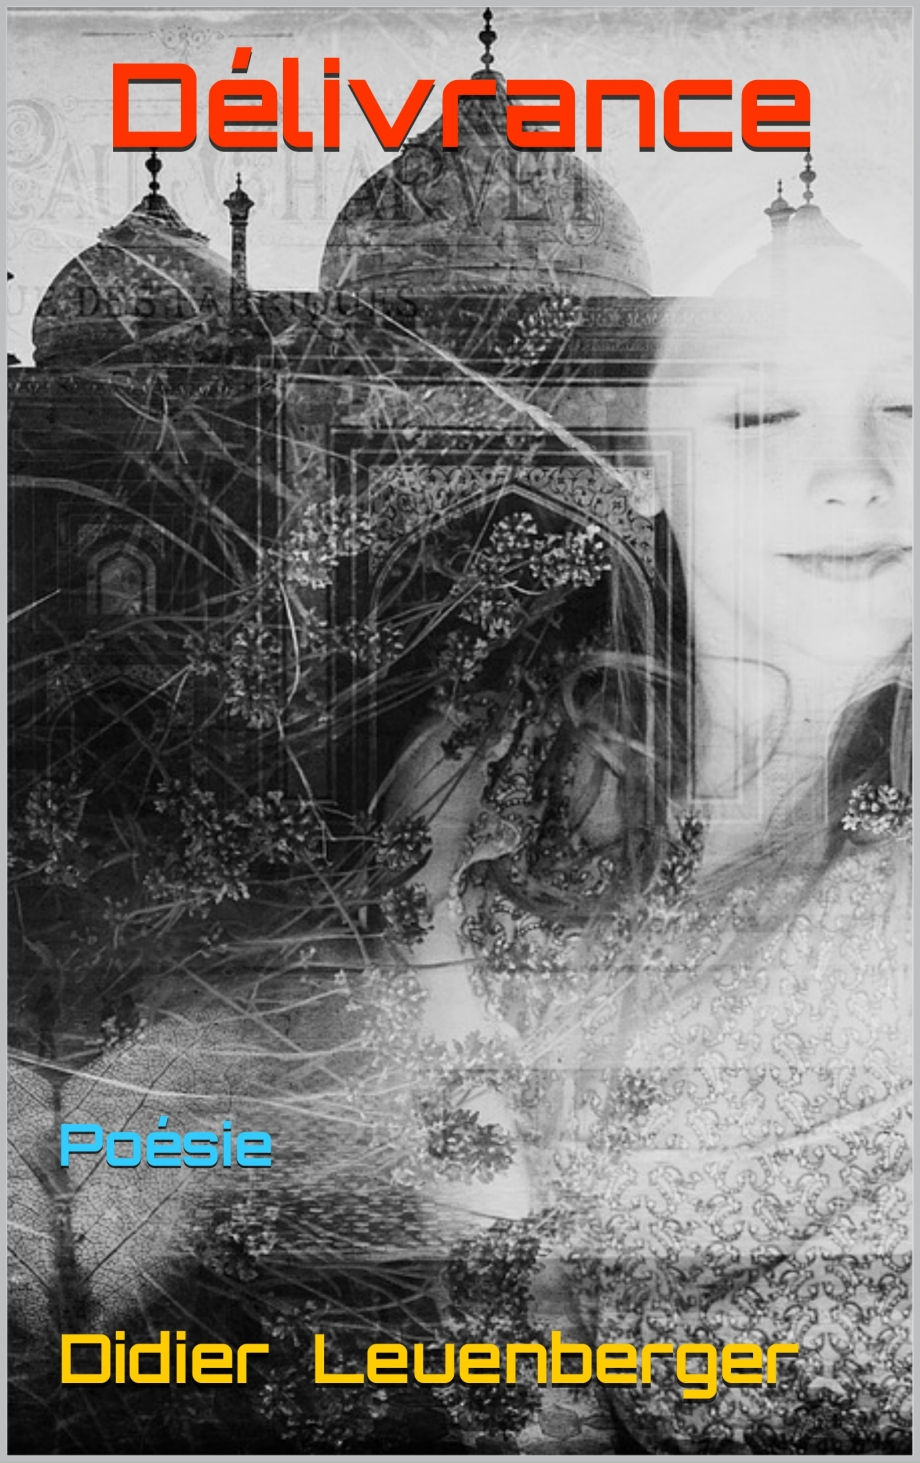 edeaece7-ccf3-4fb8-ab27-2953e688b586.jpg